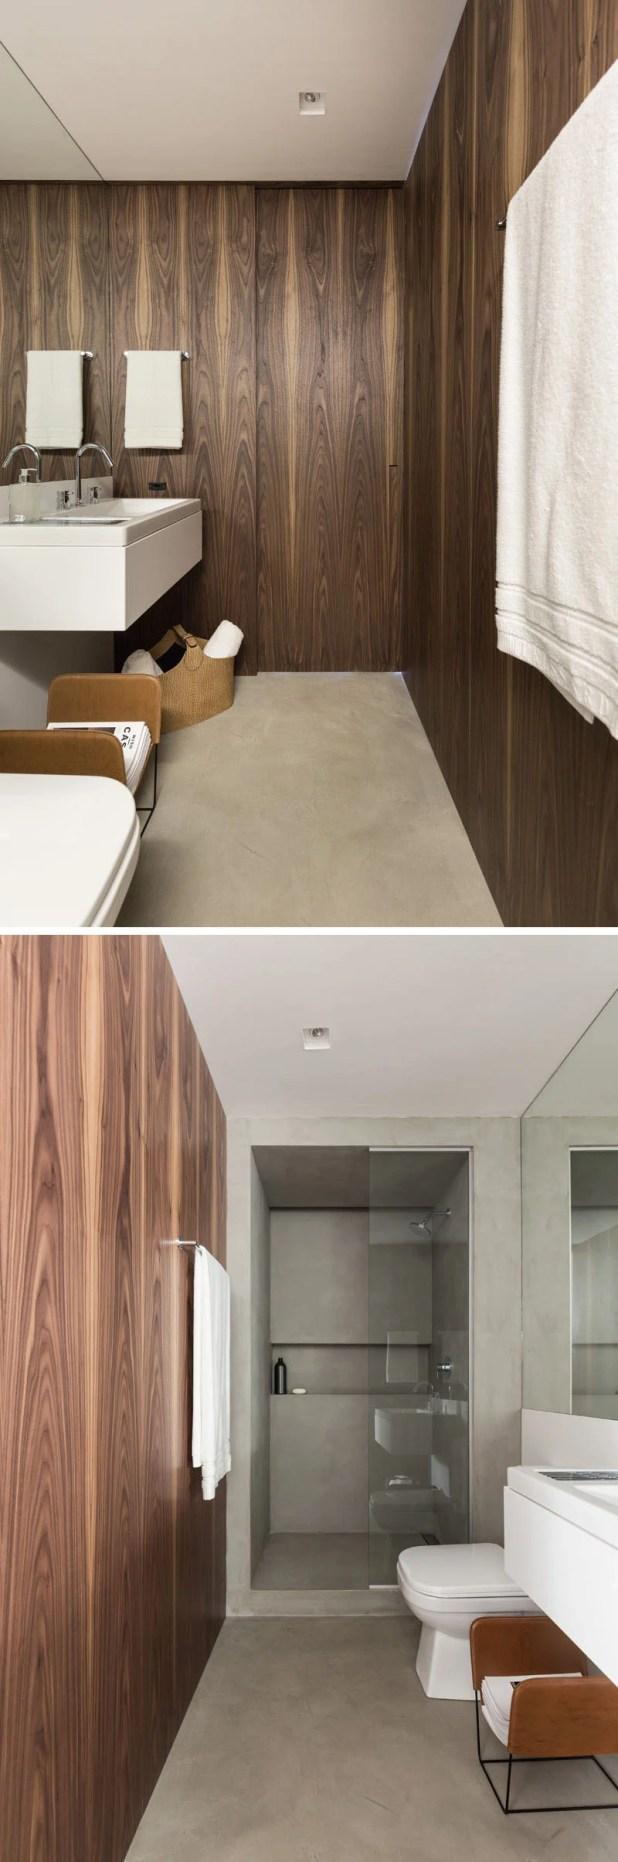 small-bathroom-design-071216-927-07